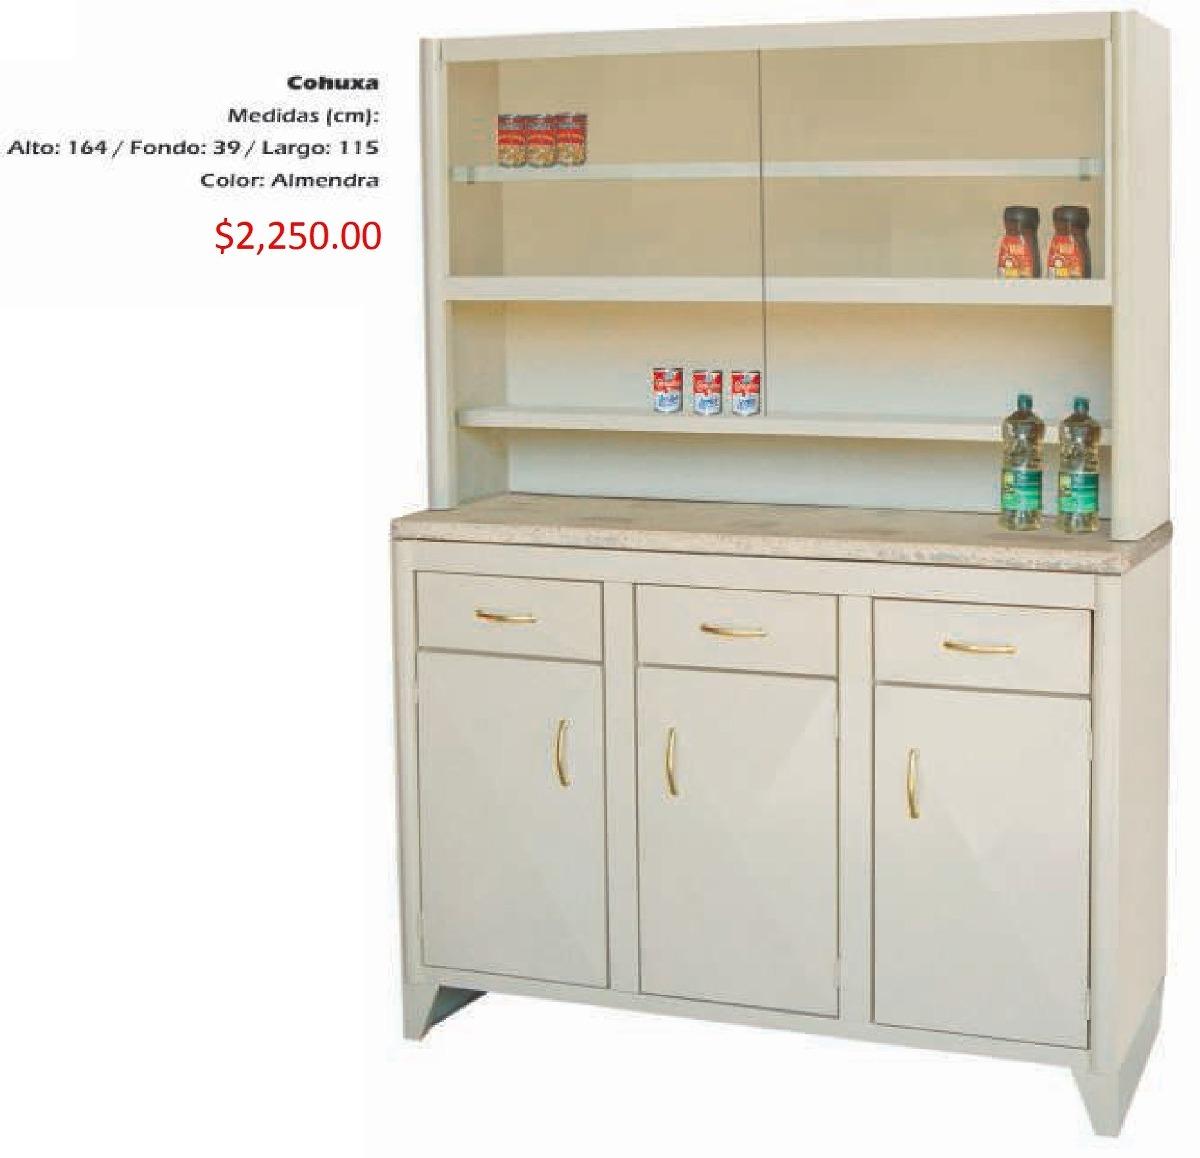 Muebles de cocina para armar mercadolibre for Muebles de cocina xoane